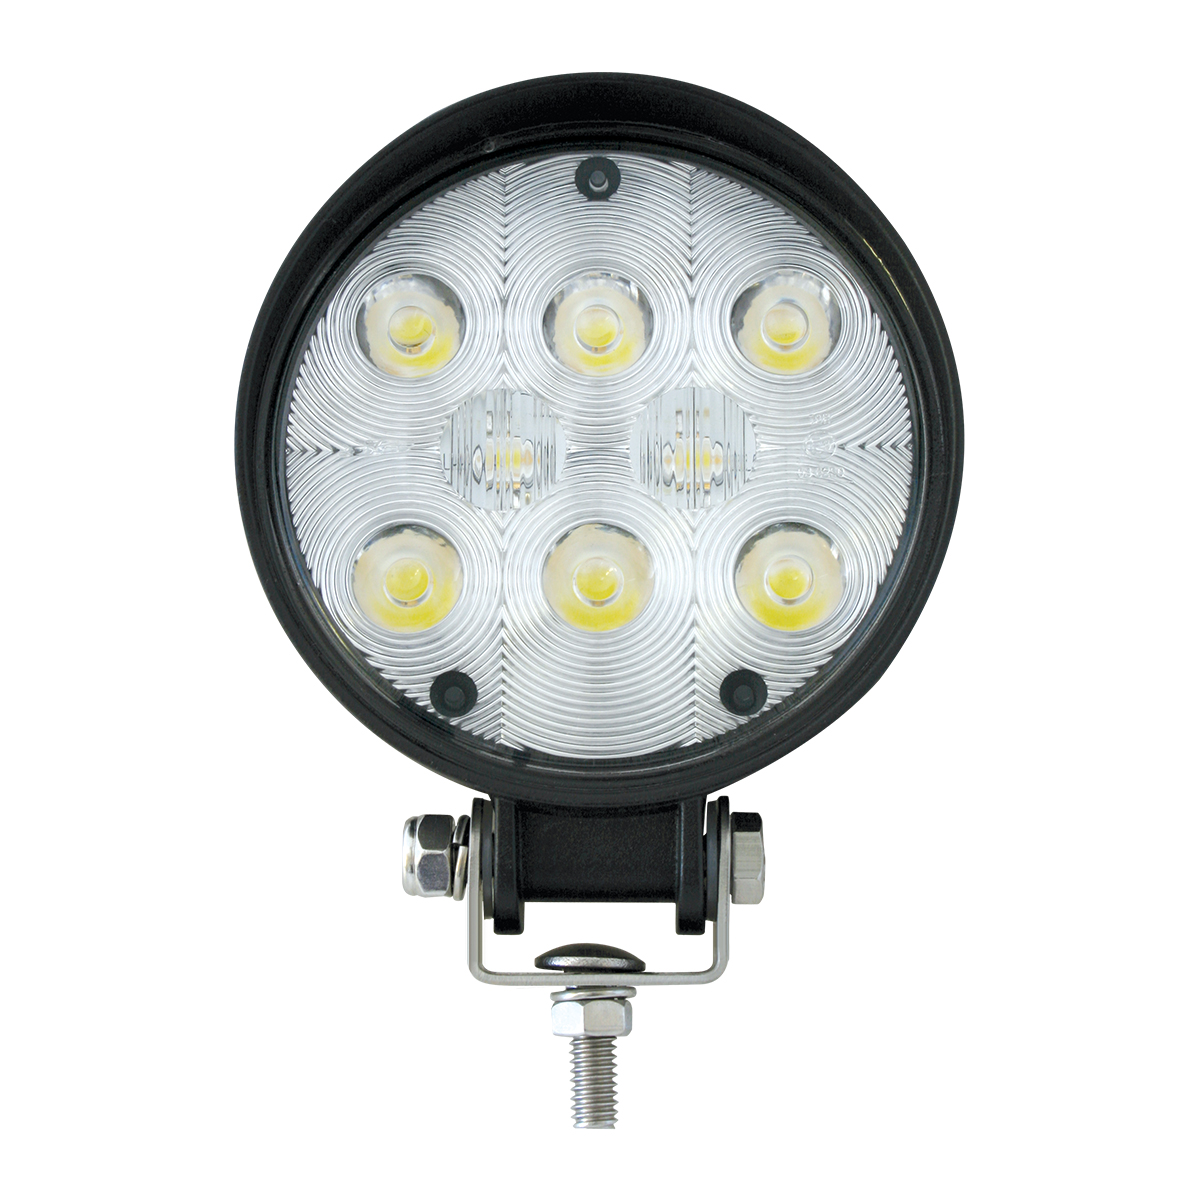 76350 Large High Power LED Work Light